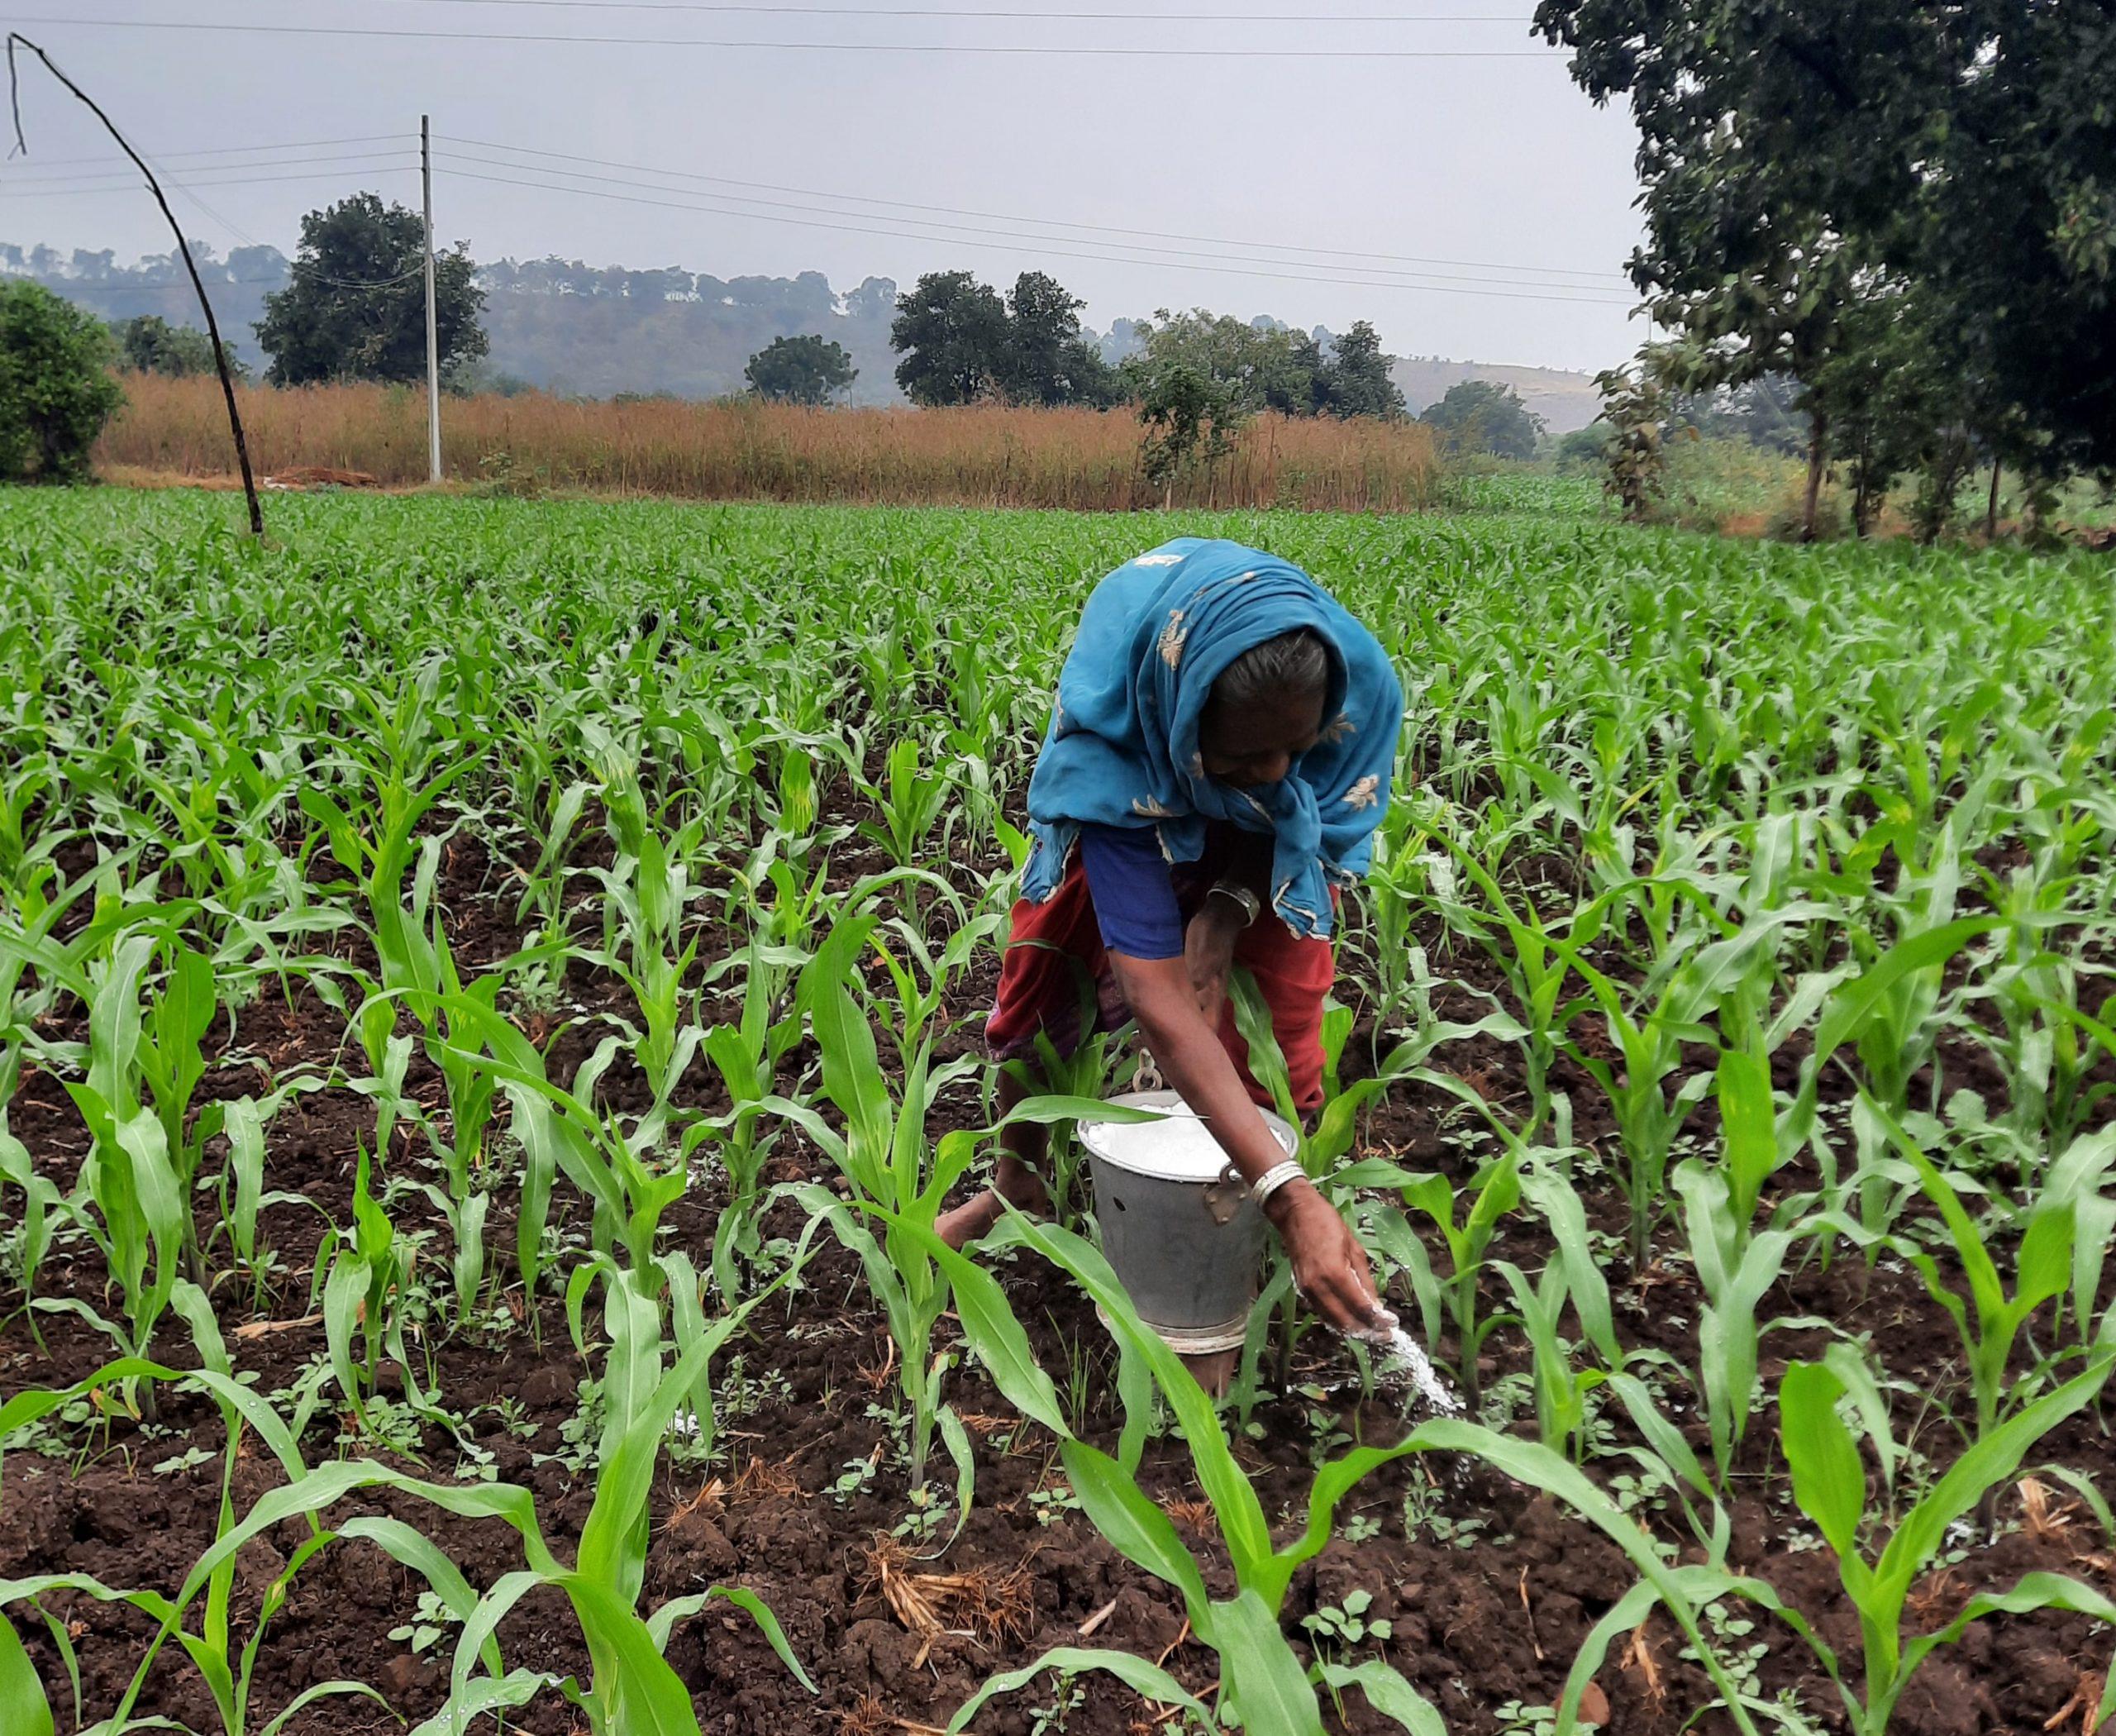 A farmer fertilizing maize plants